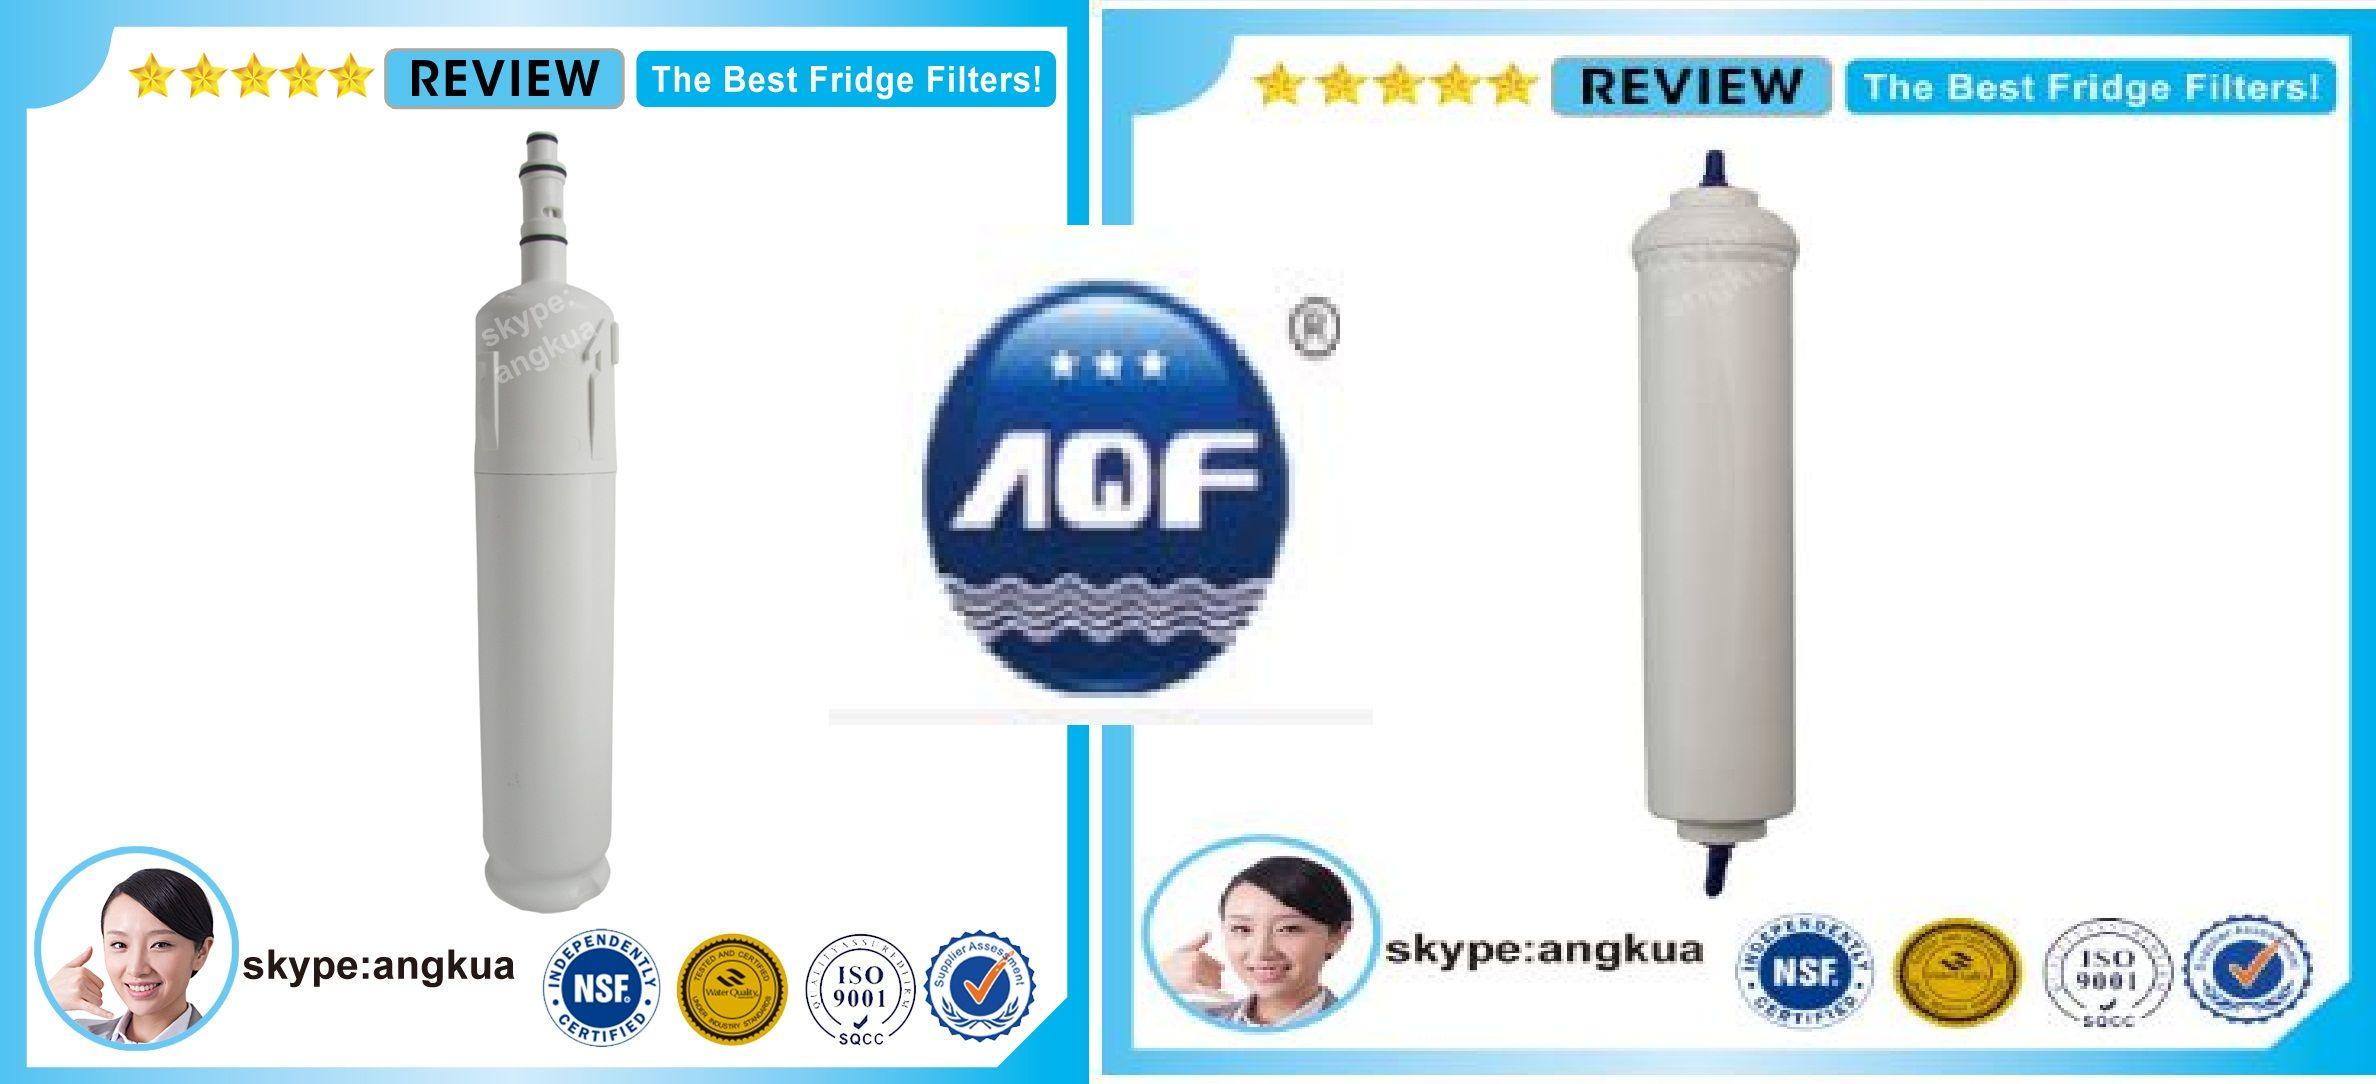 how to reset samsung refrigerator filter indicator